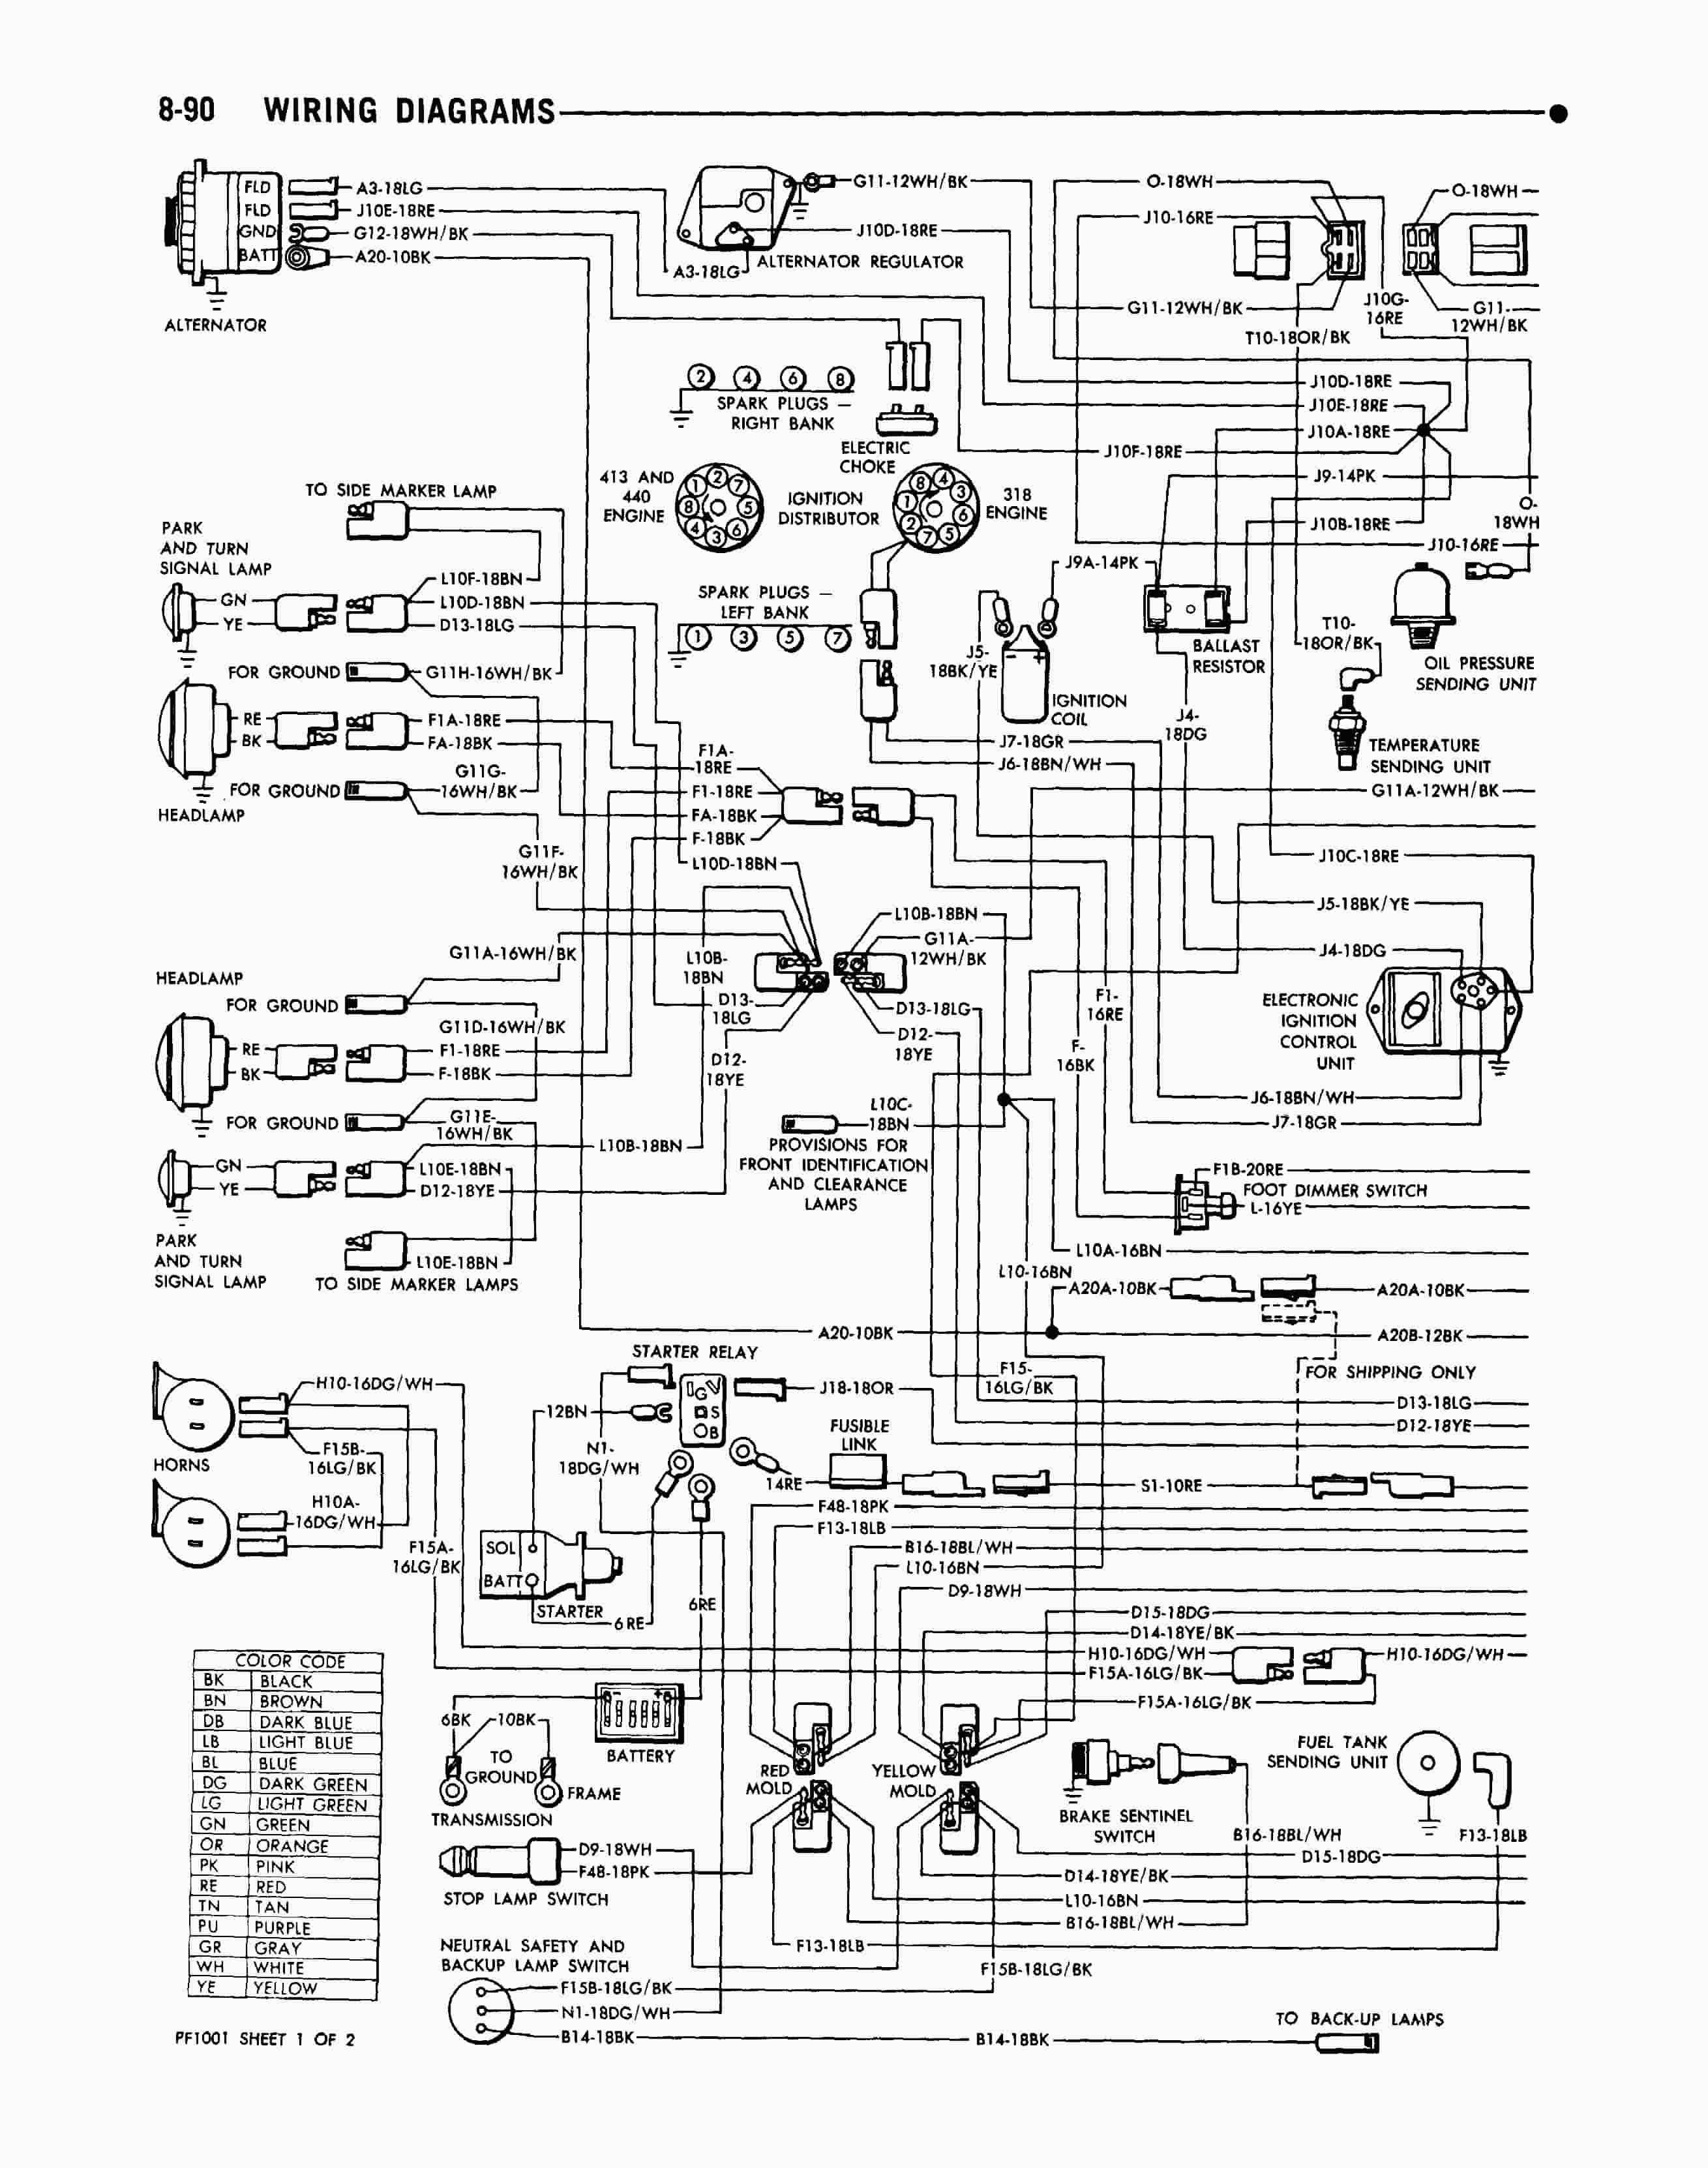 2005 Mack Truck Wiring Diagram 99 Suburban Blower Wiring Diagram Sportster Wiring Tukune Jeanjaures37 Fr